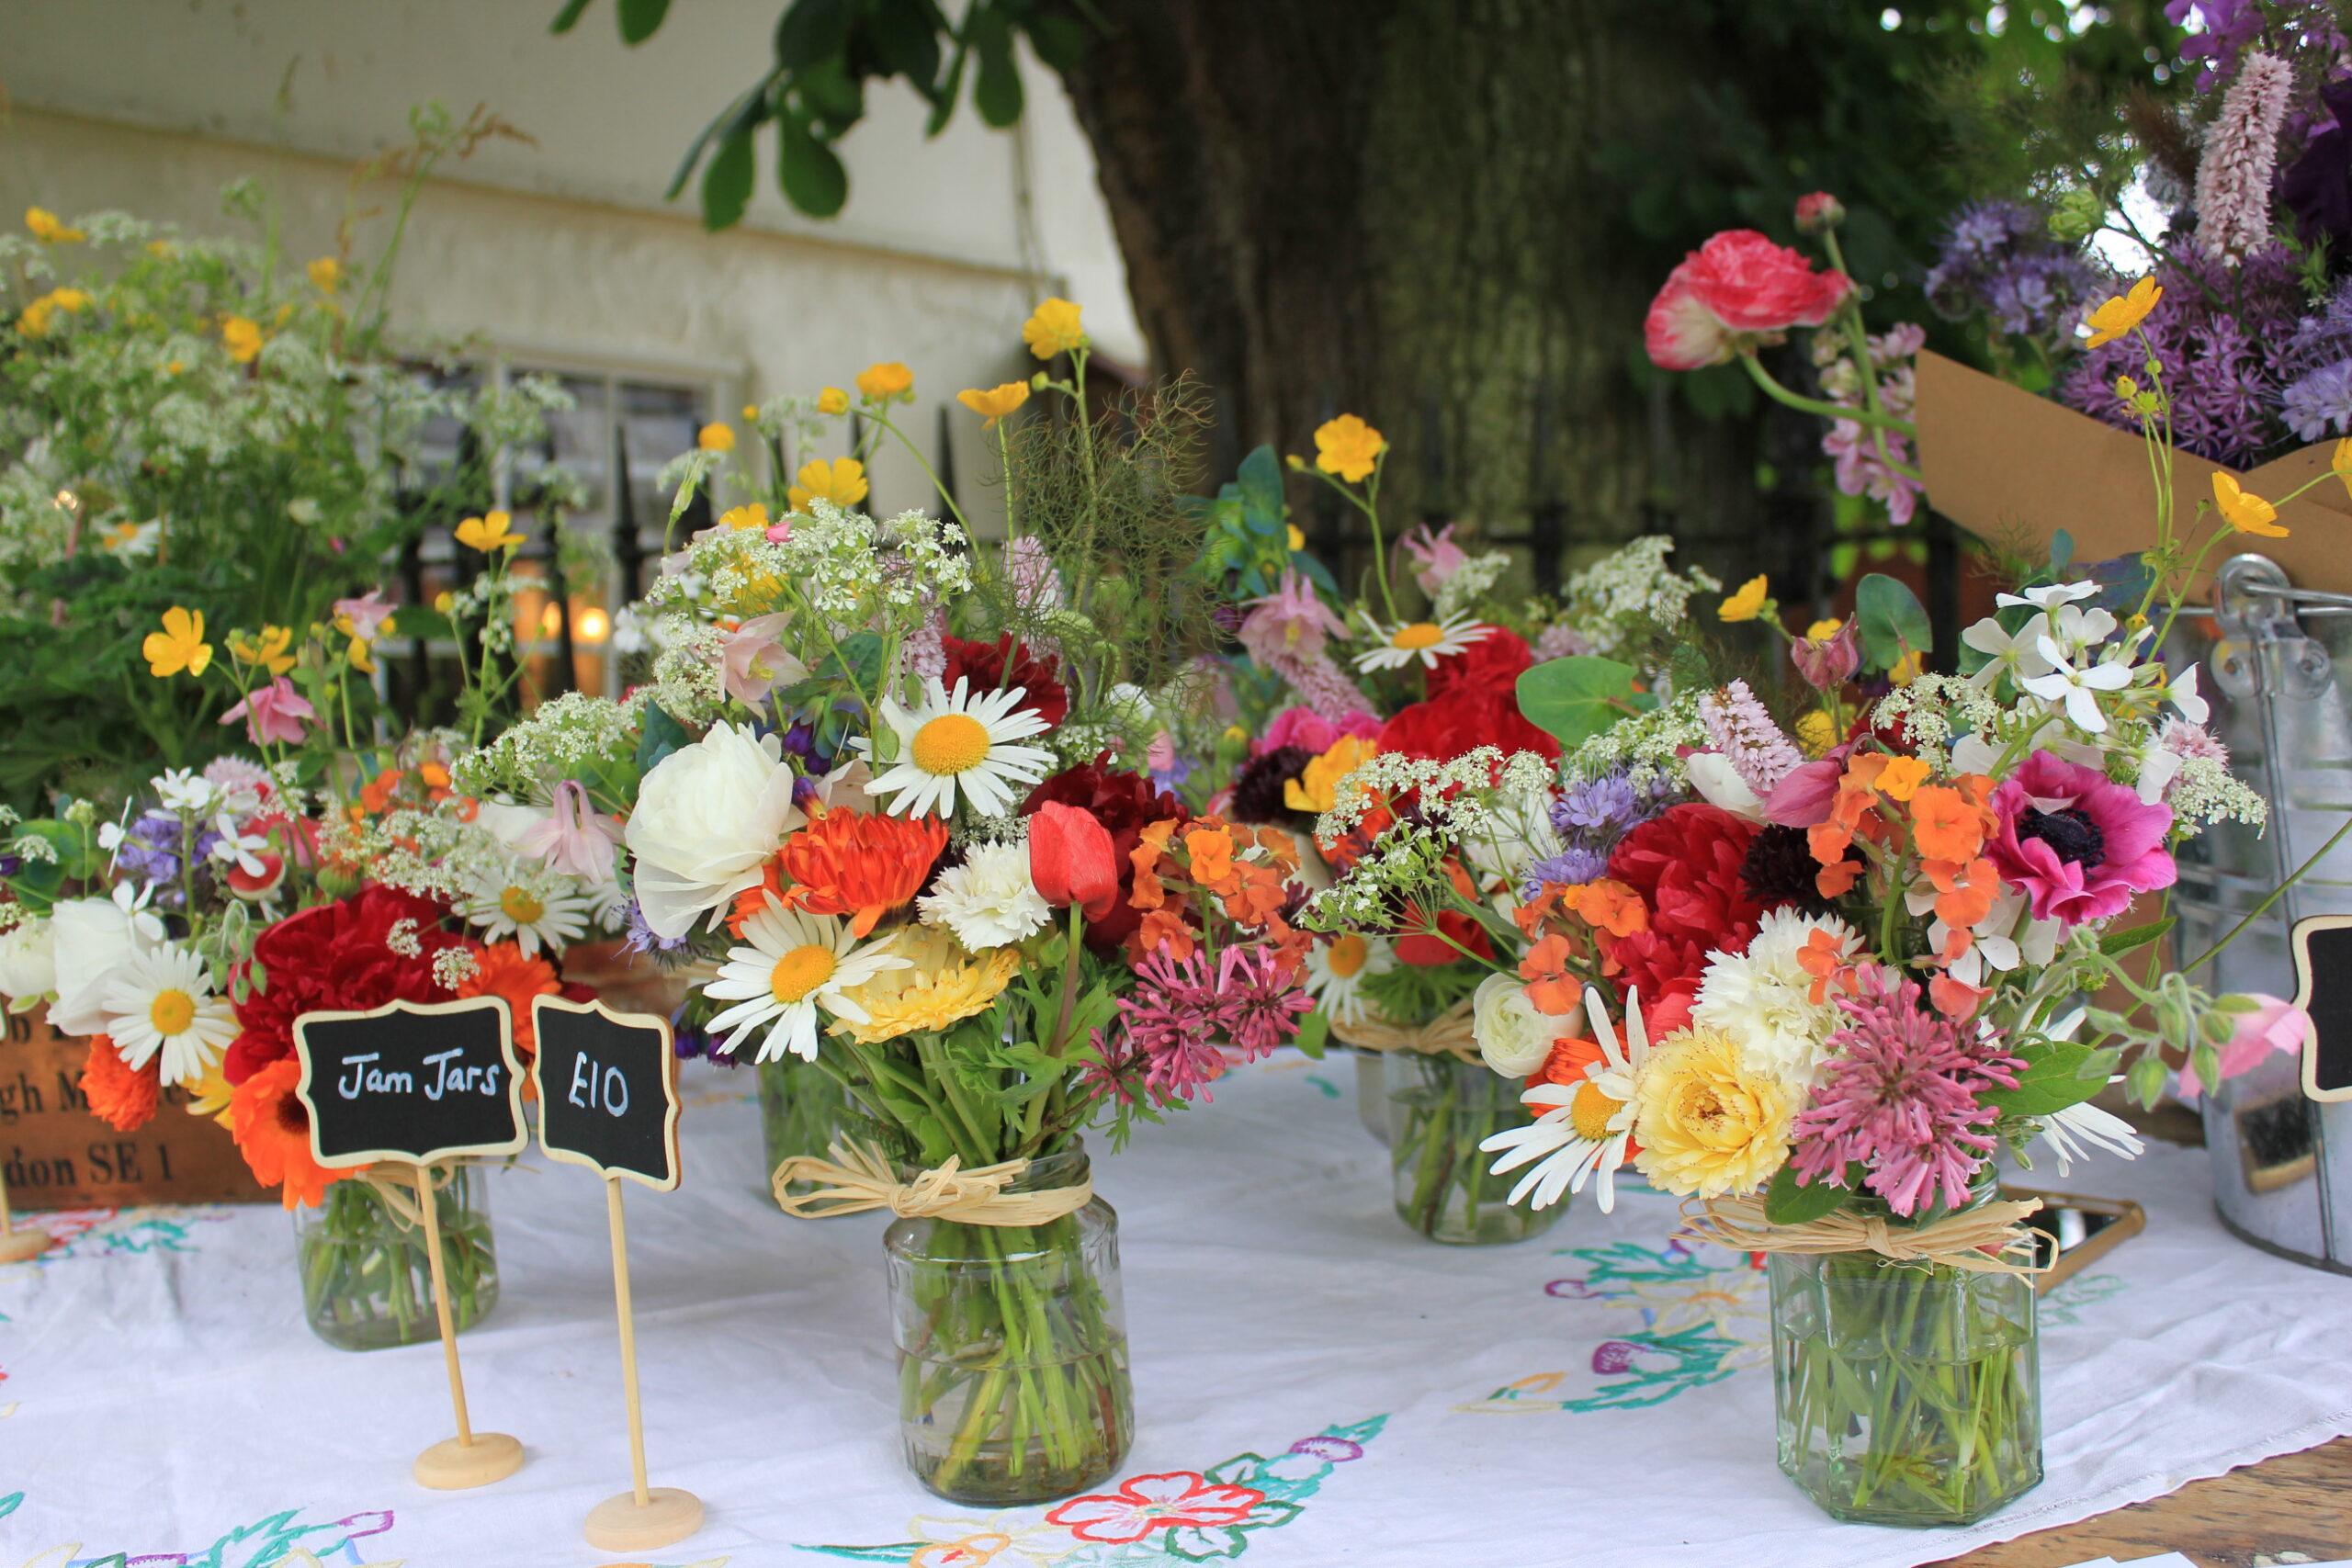 Jam jars of seasonal British flowers being sold at market